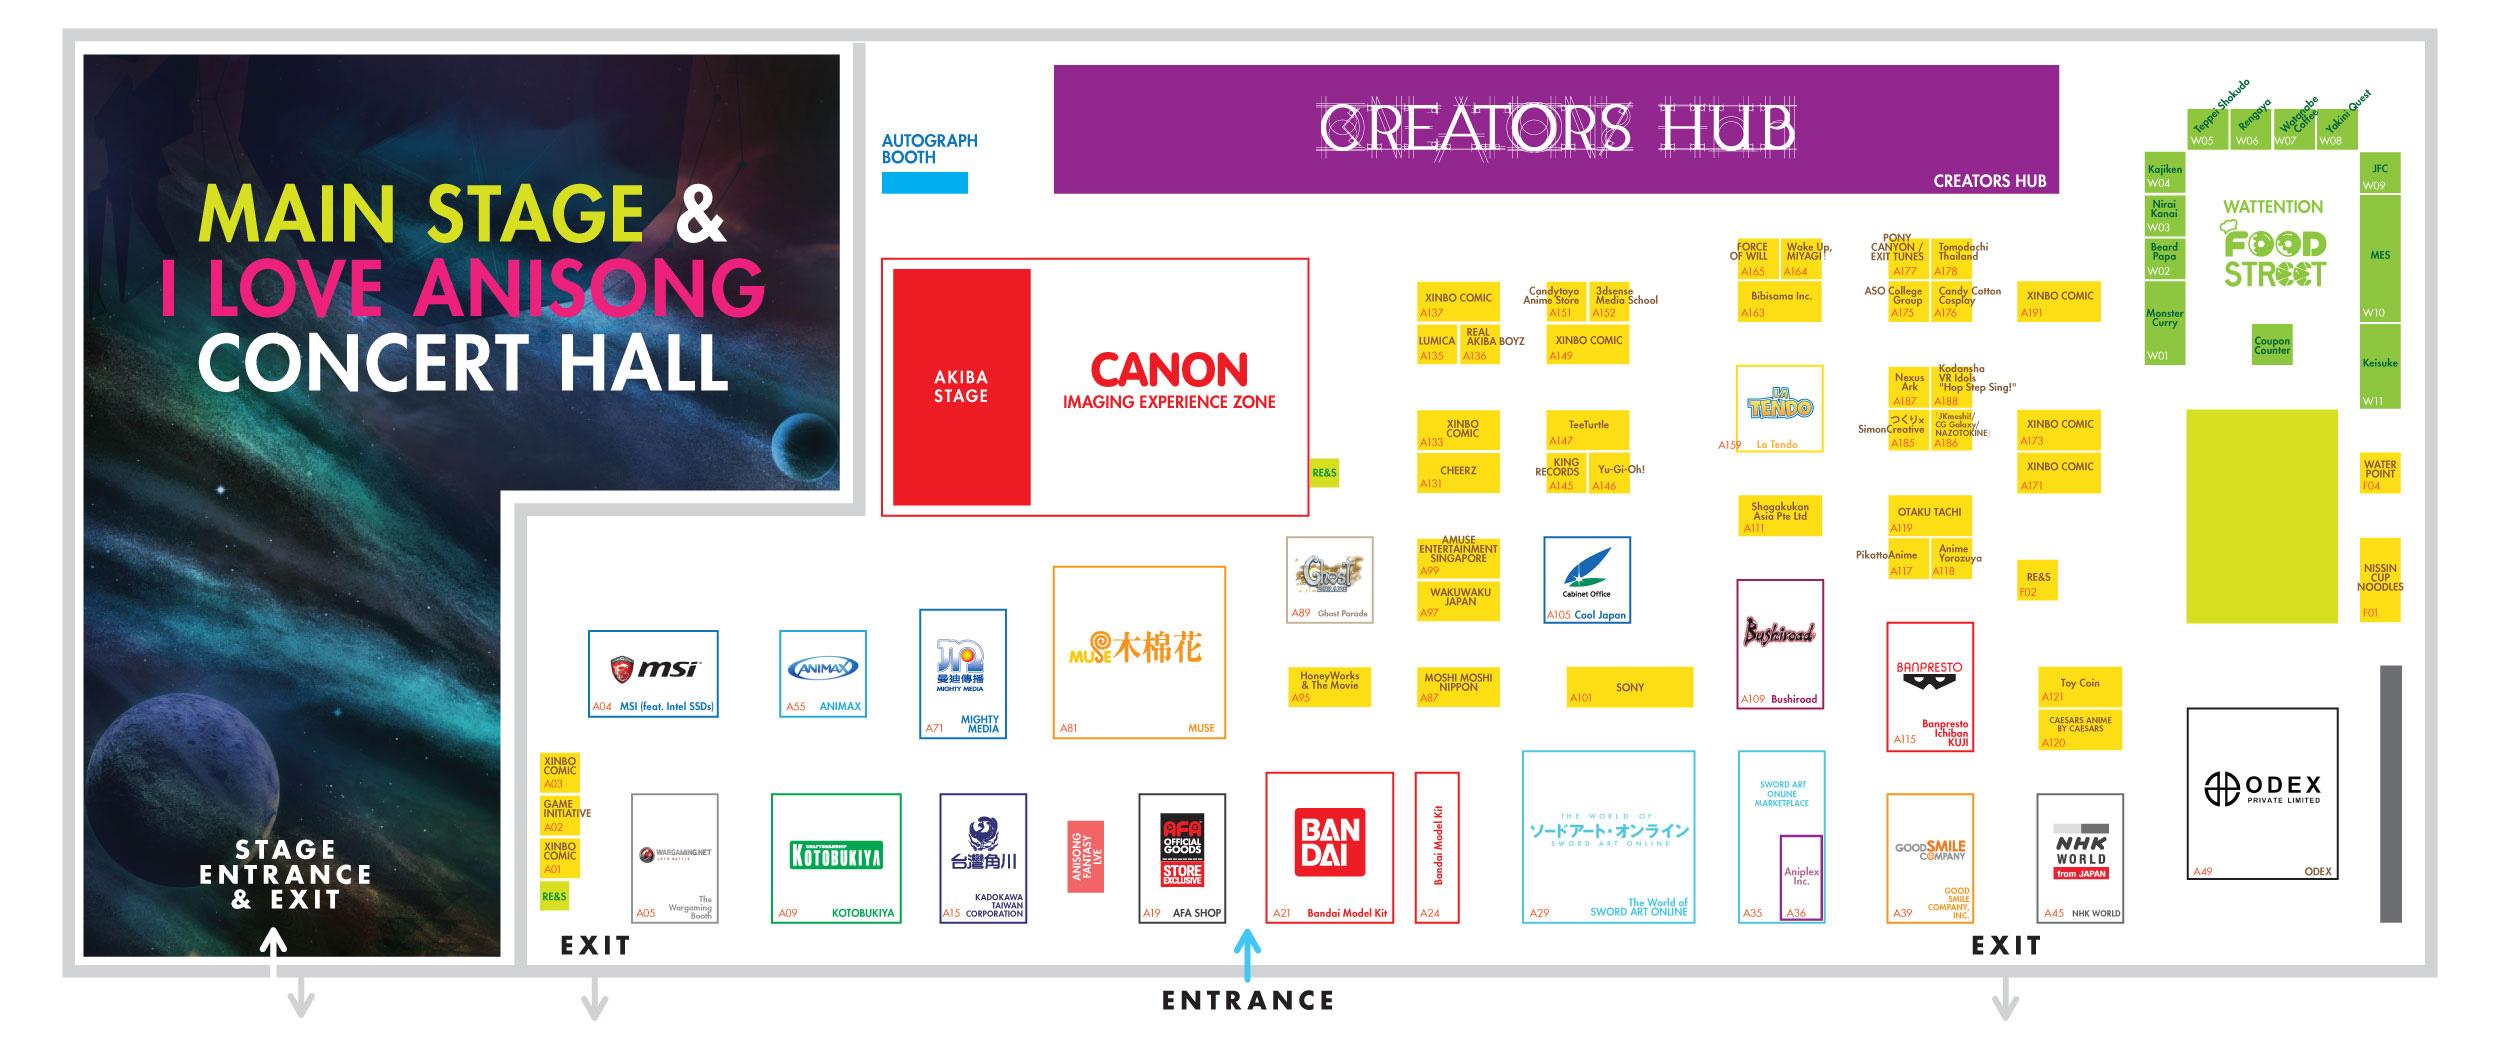 exhibitors anime festival asia singapore 2016 exhibition floor plan